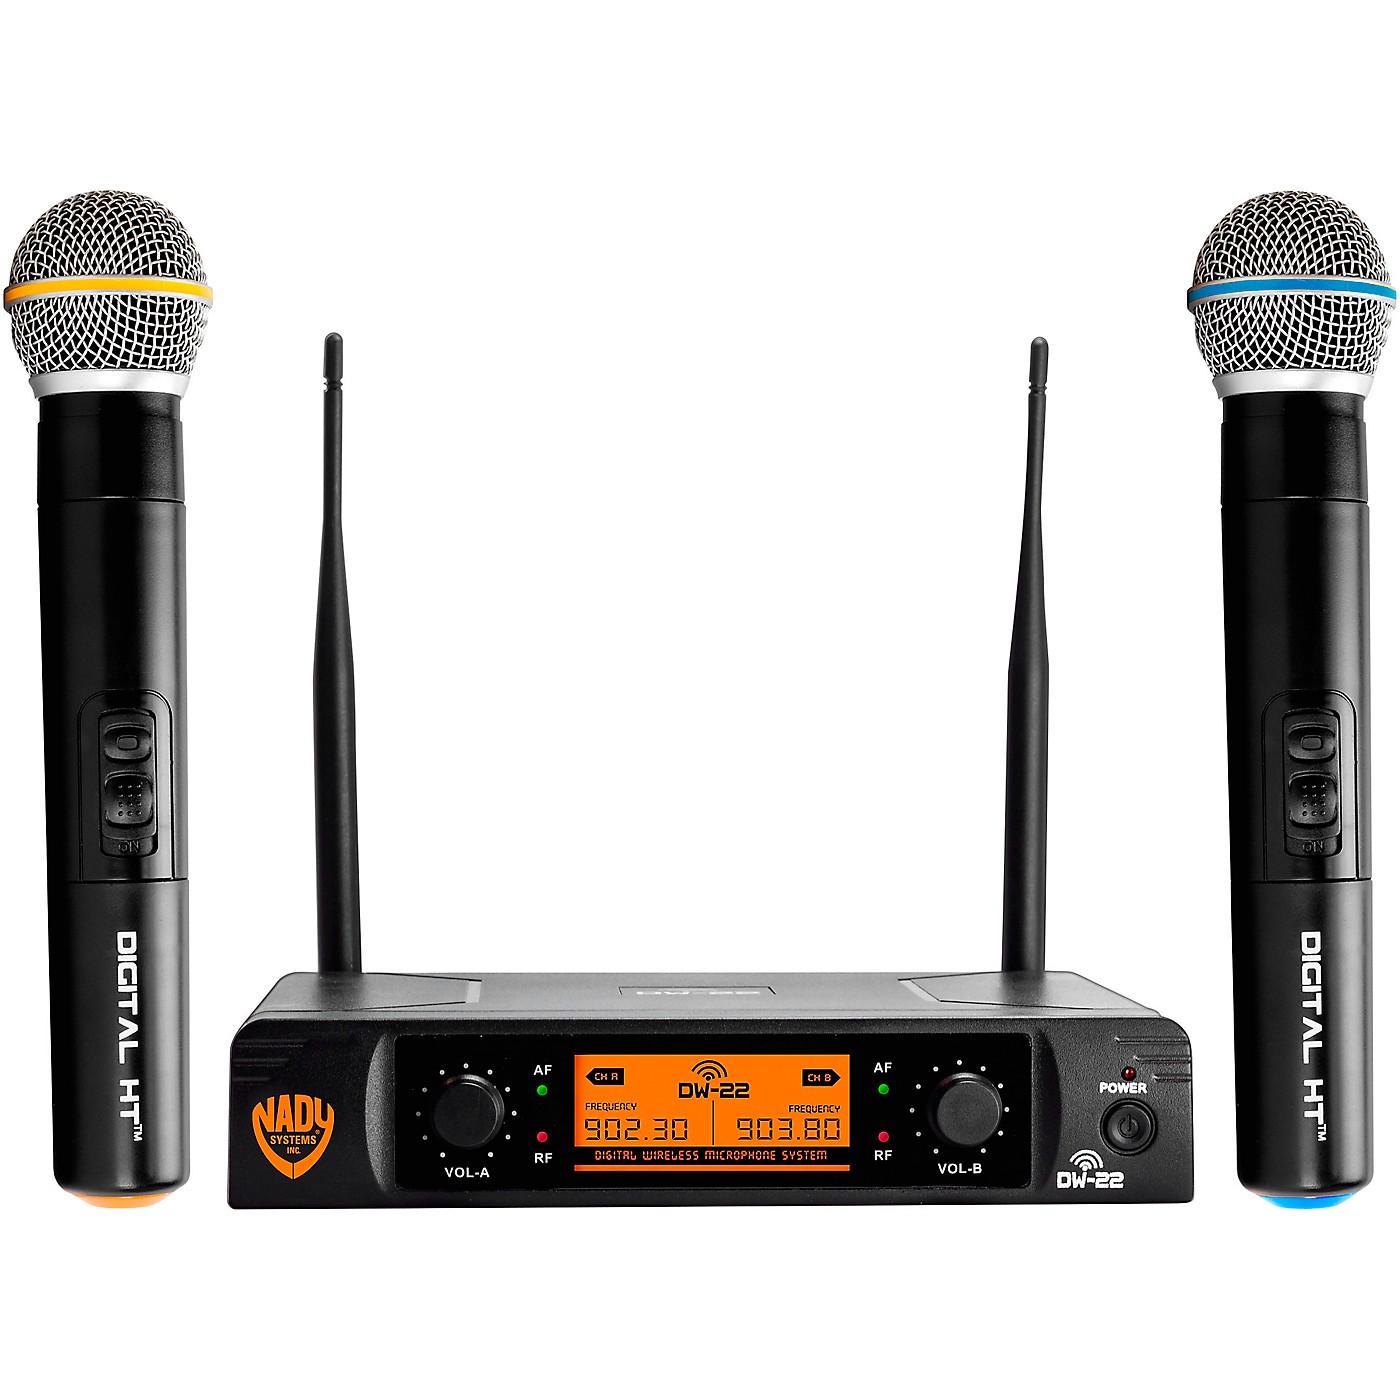 Nady DW-22 HT 24 bit Digital Dual Handheld Wireless Microphone System thumbnail